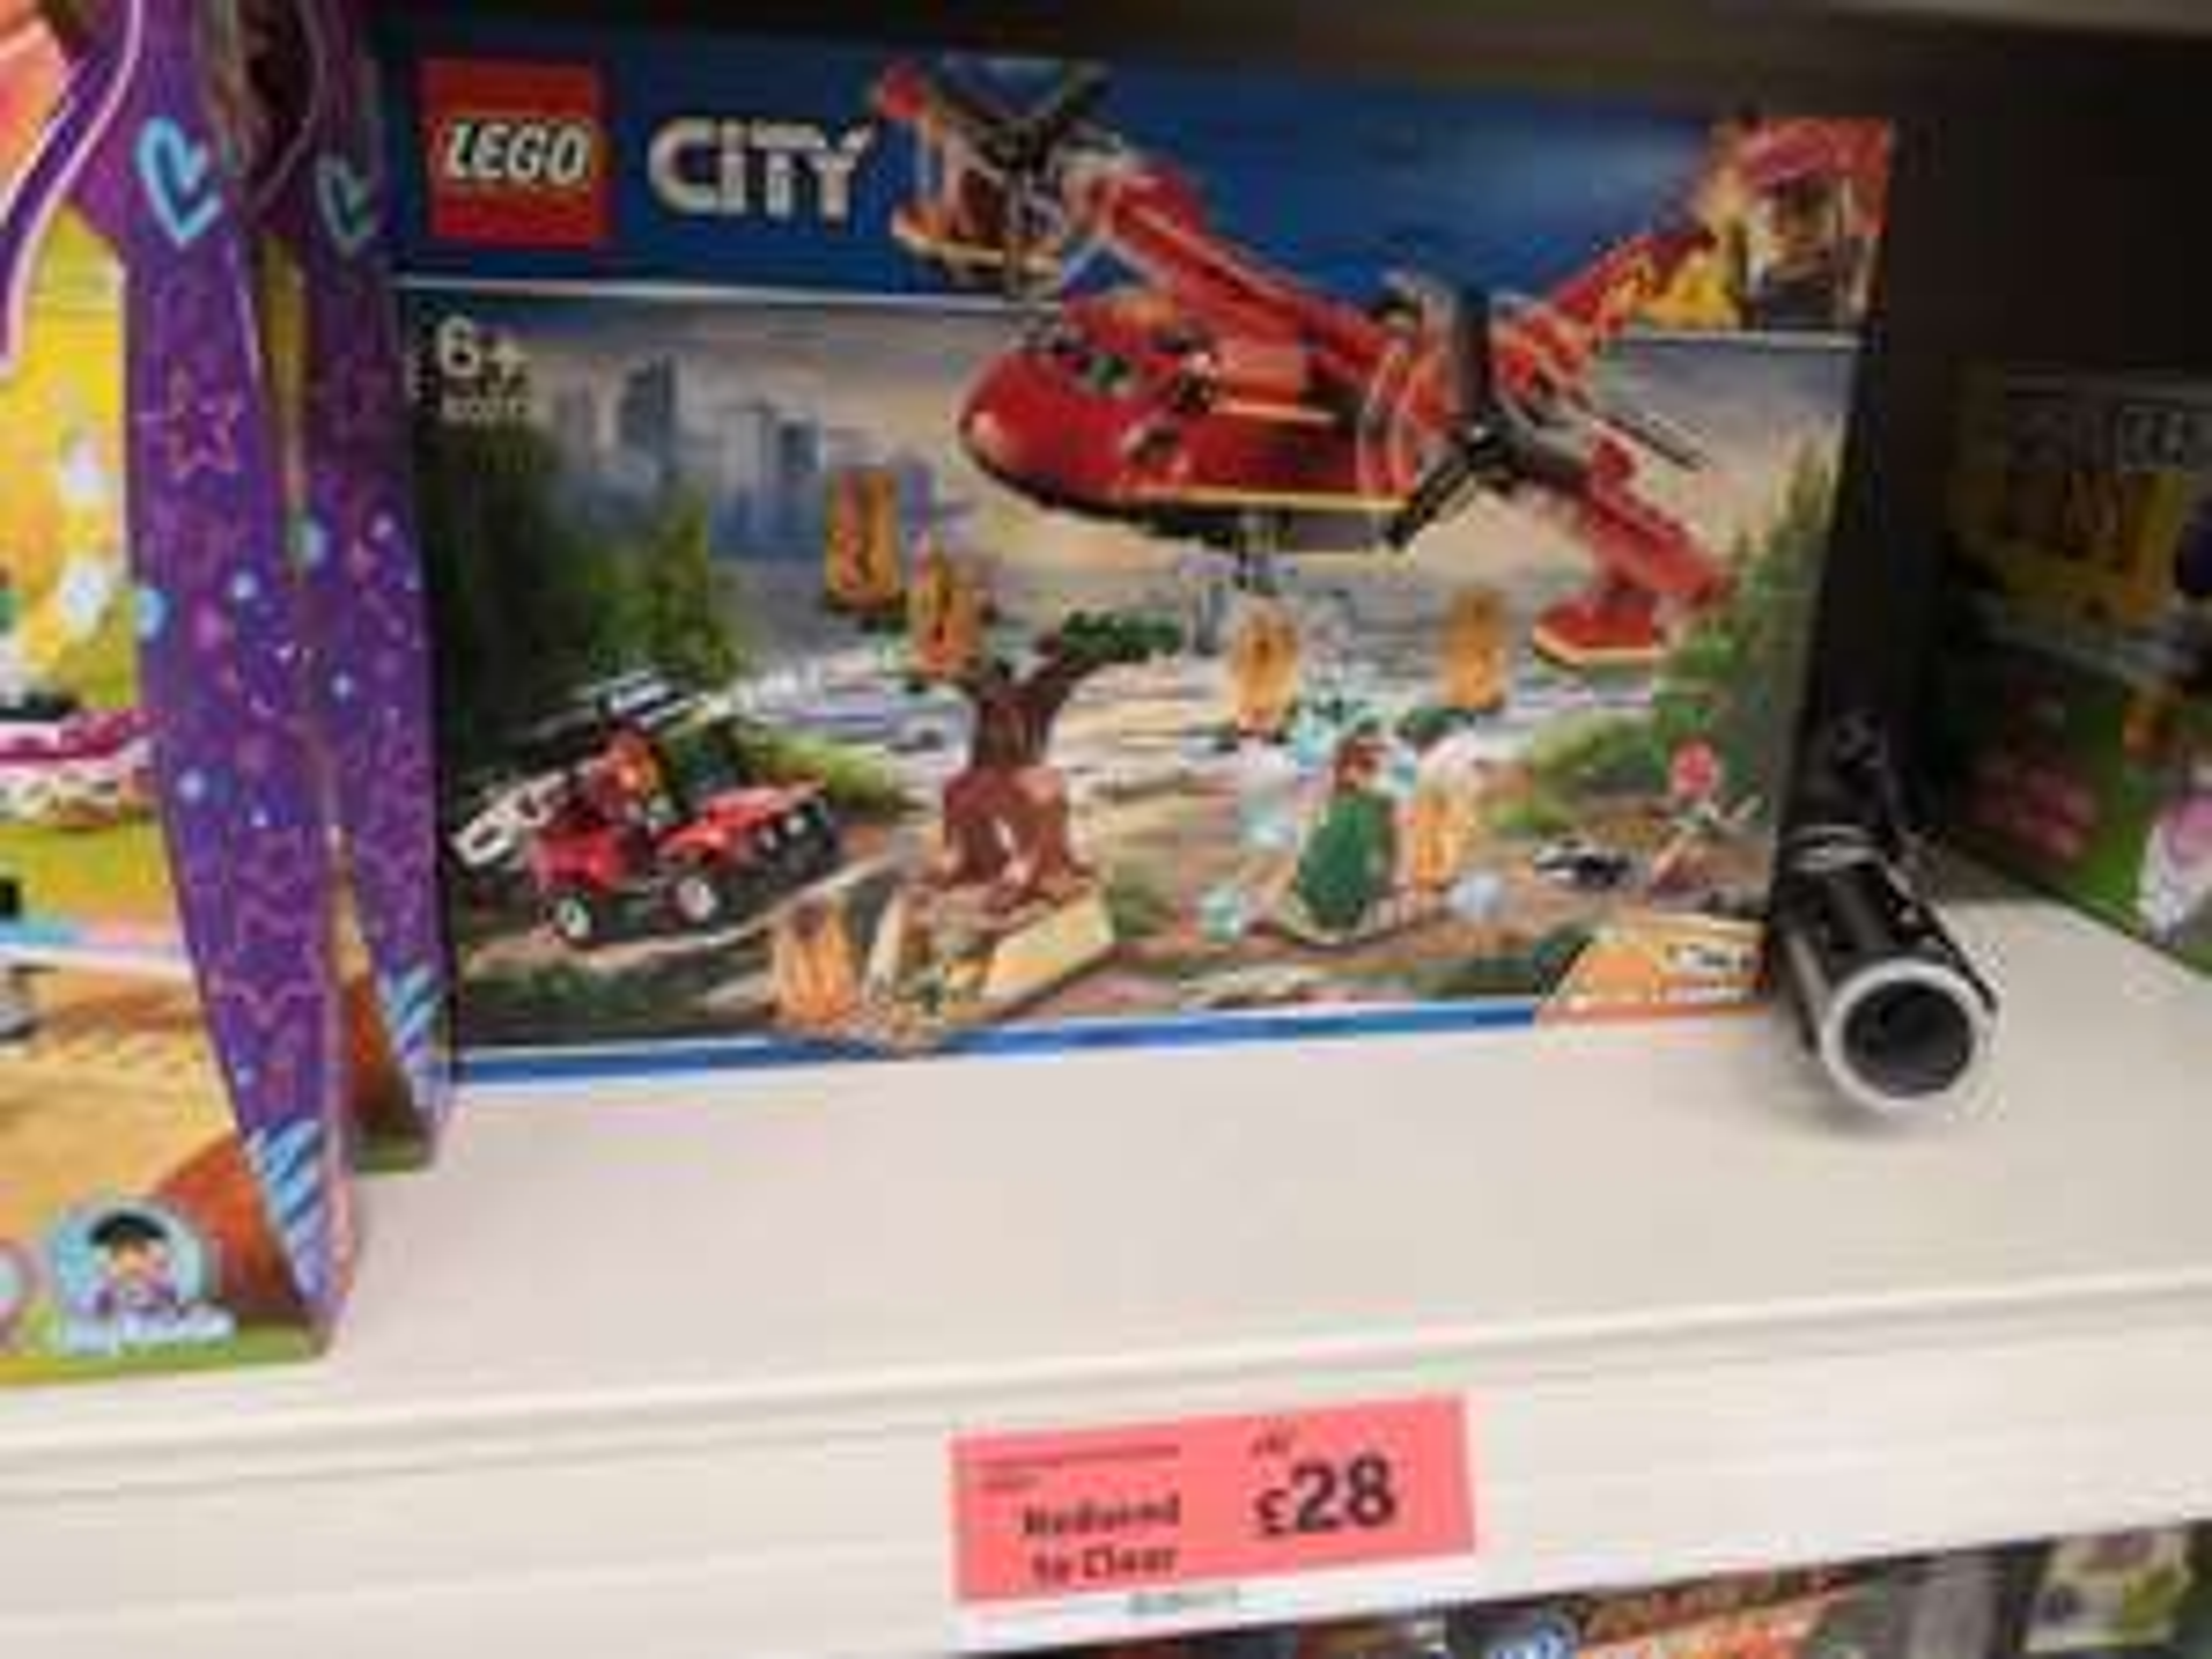 Lego City Deals Cheap Price Best Sale In Uk Hotukdeals